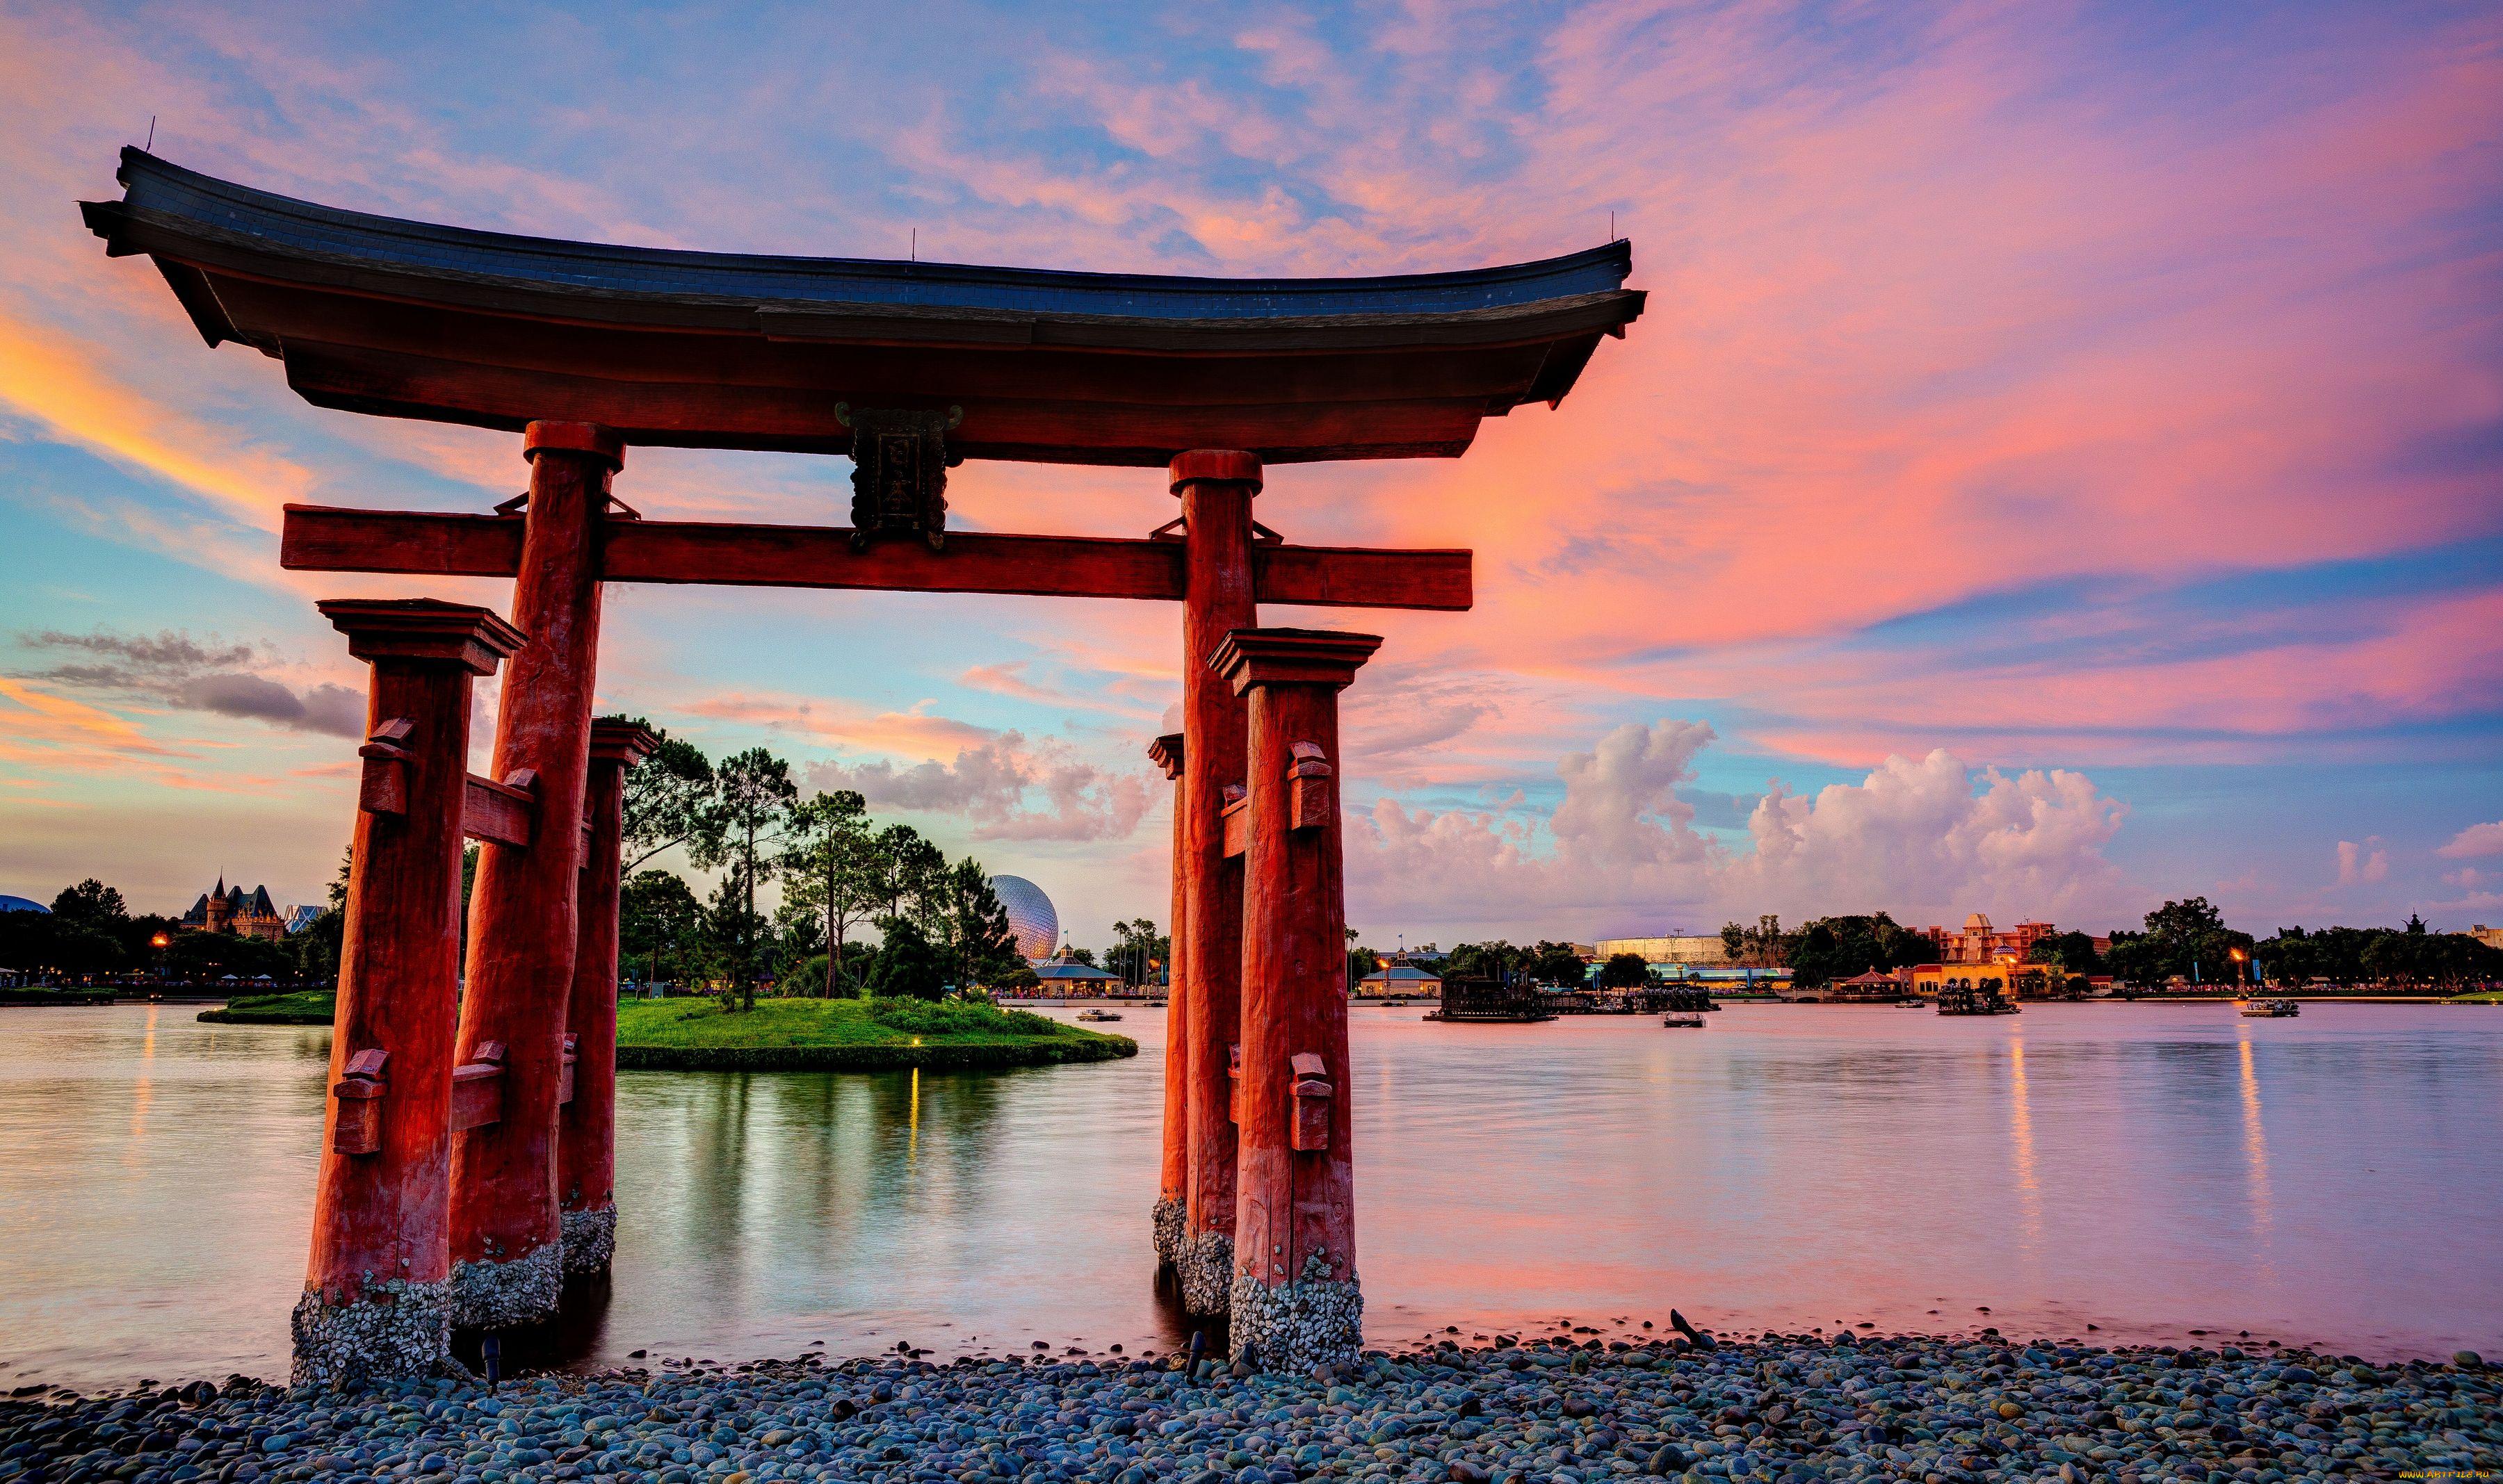 torii gate drawing - HD2698×1600